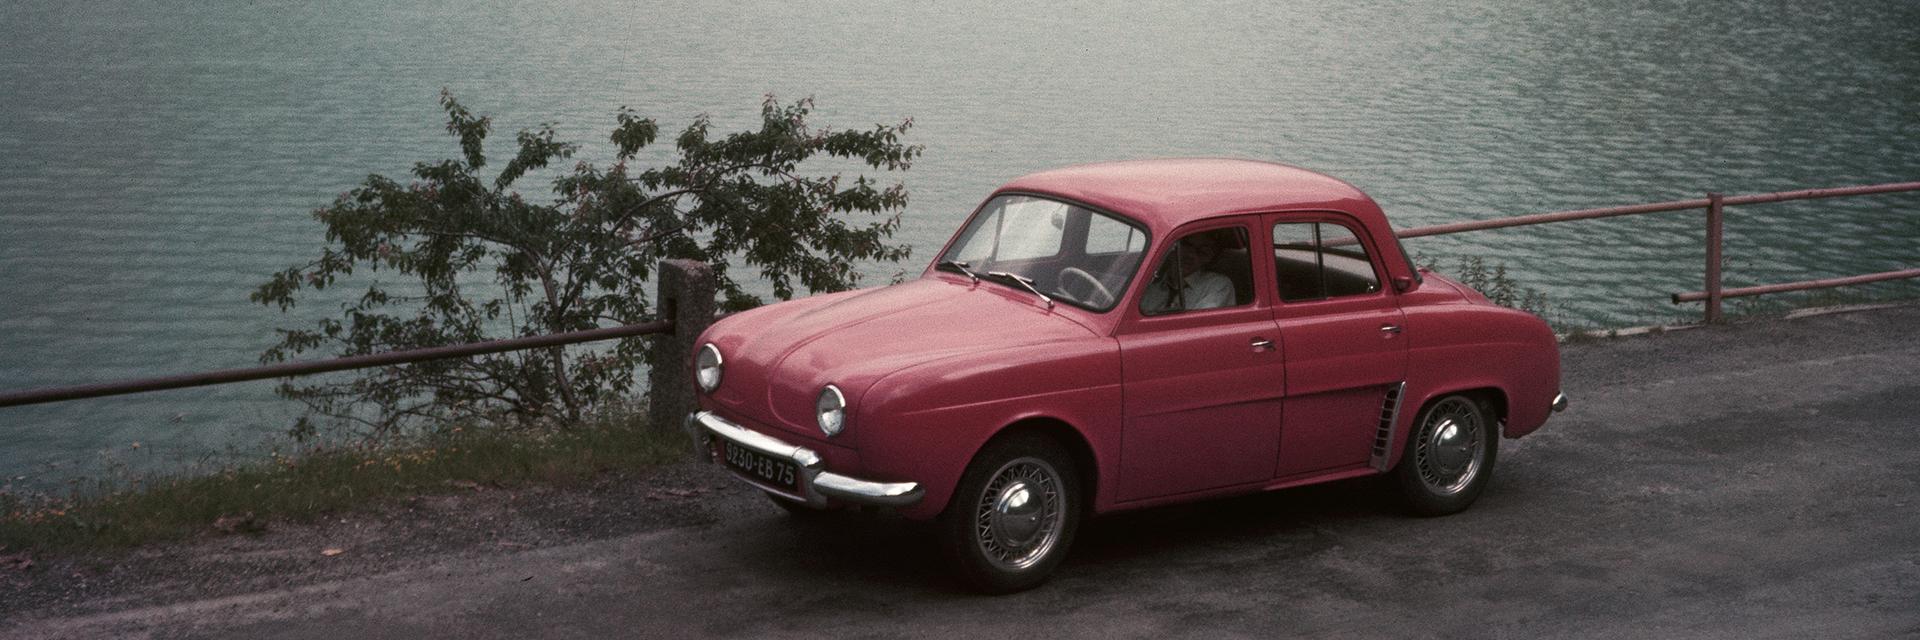 Renault Garantie -vaihtoauto